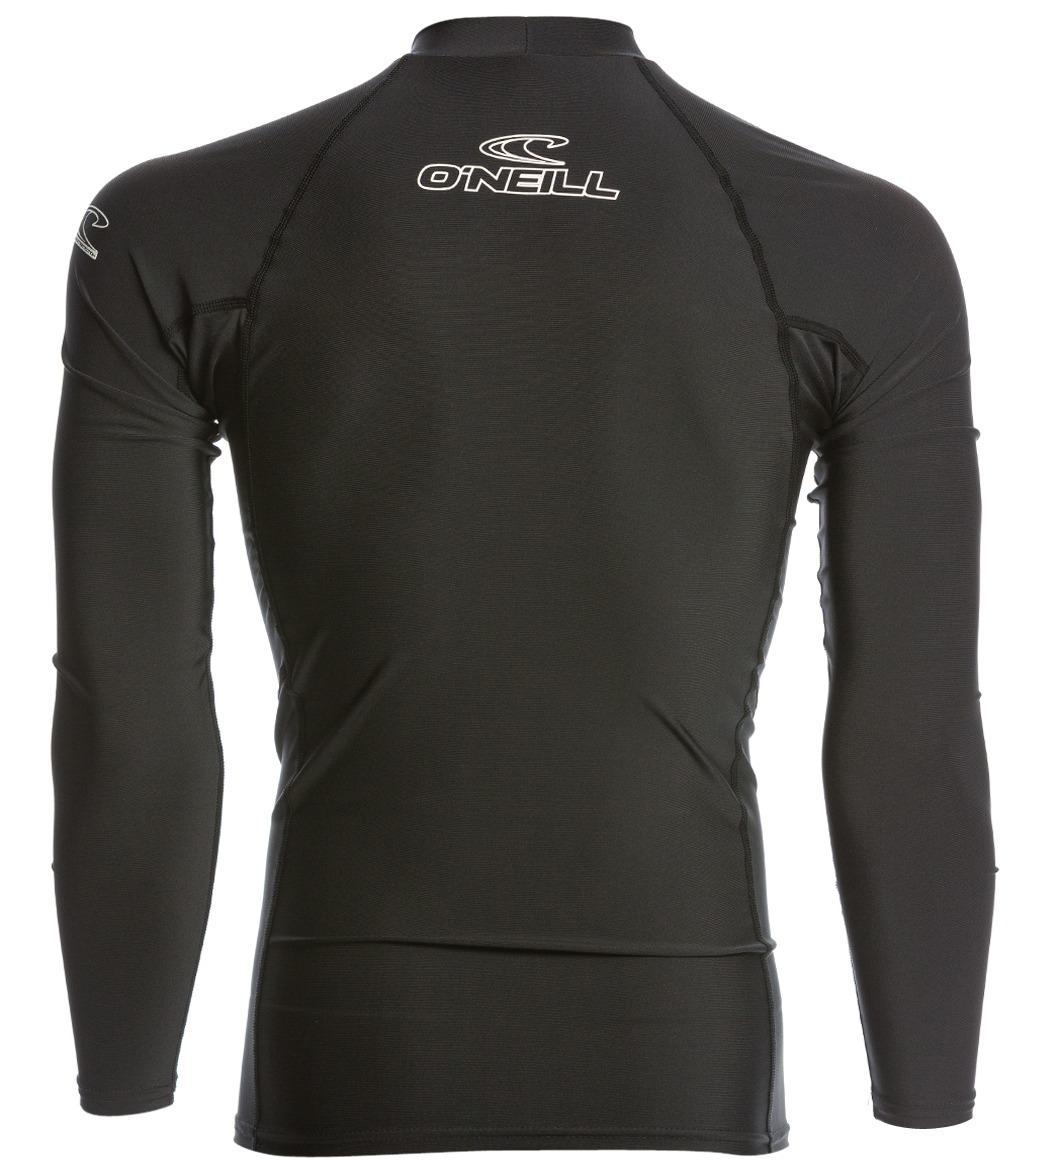 1c173aa7d0 O Neill Men s Basic Skins Long Sleeve Crew Rashguard at SwimOutlet.com